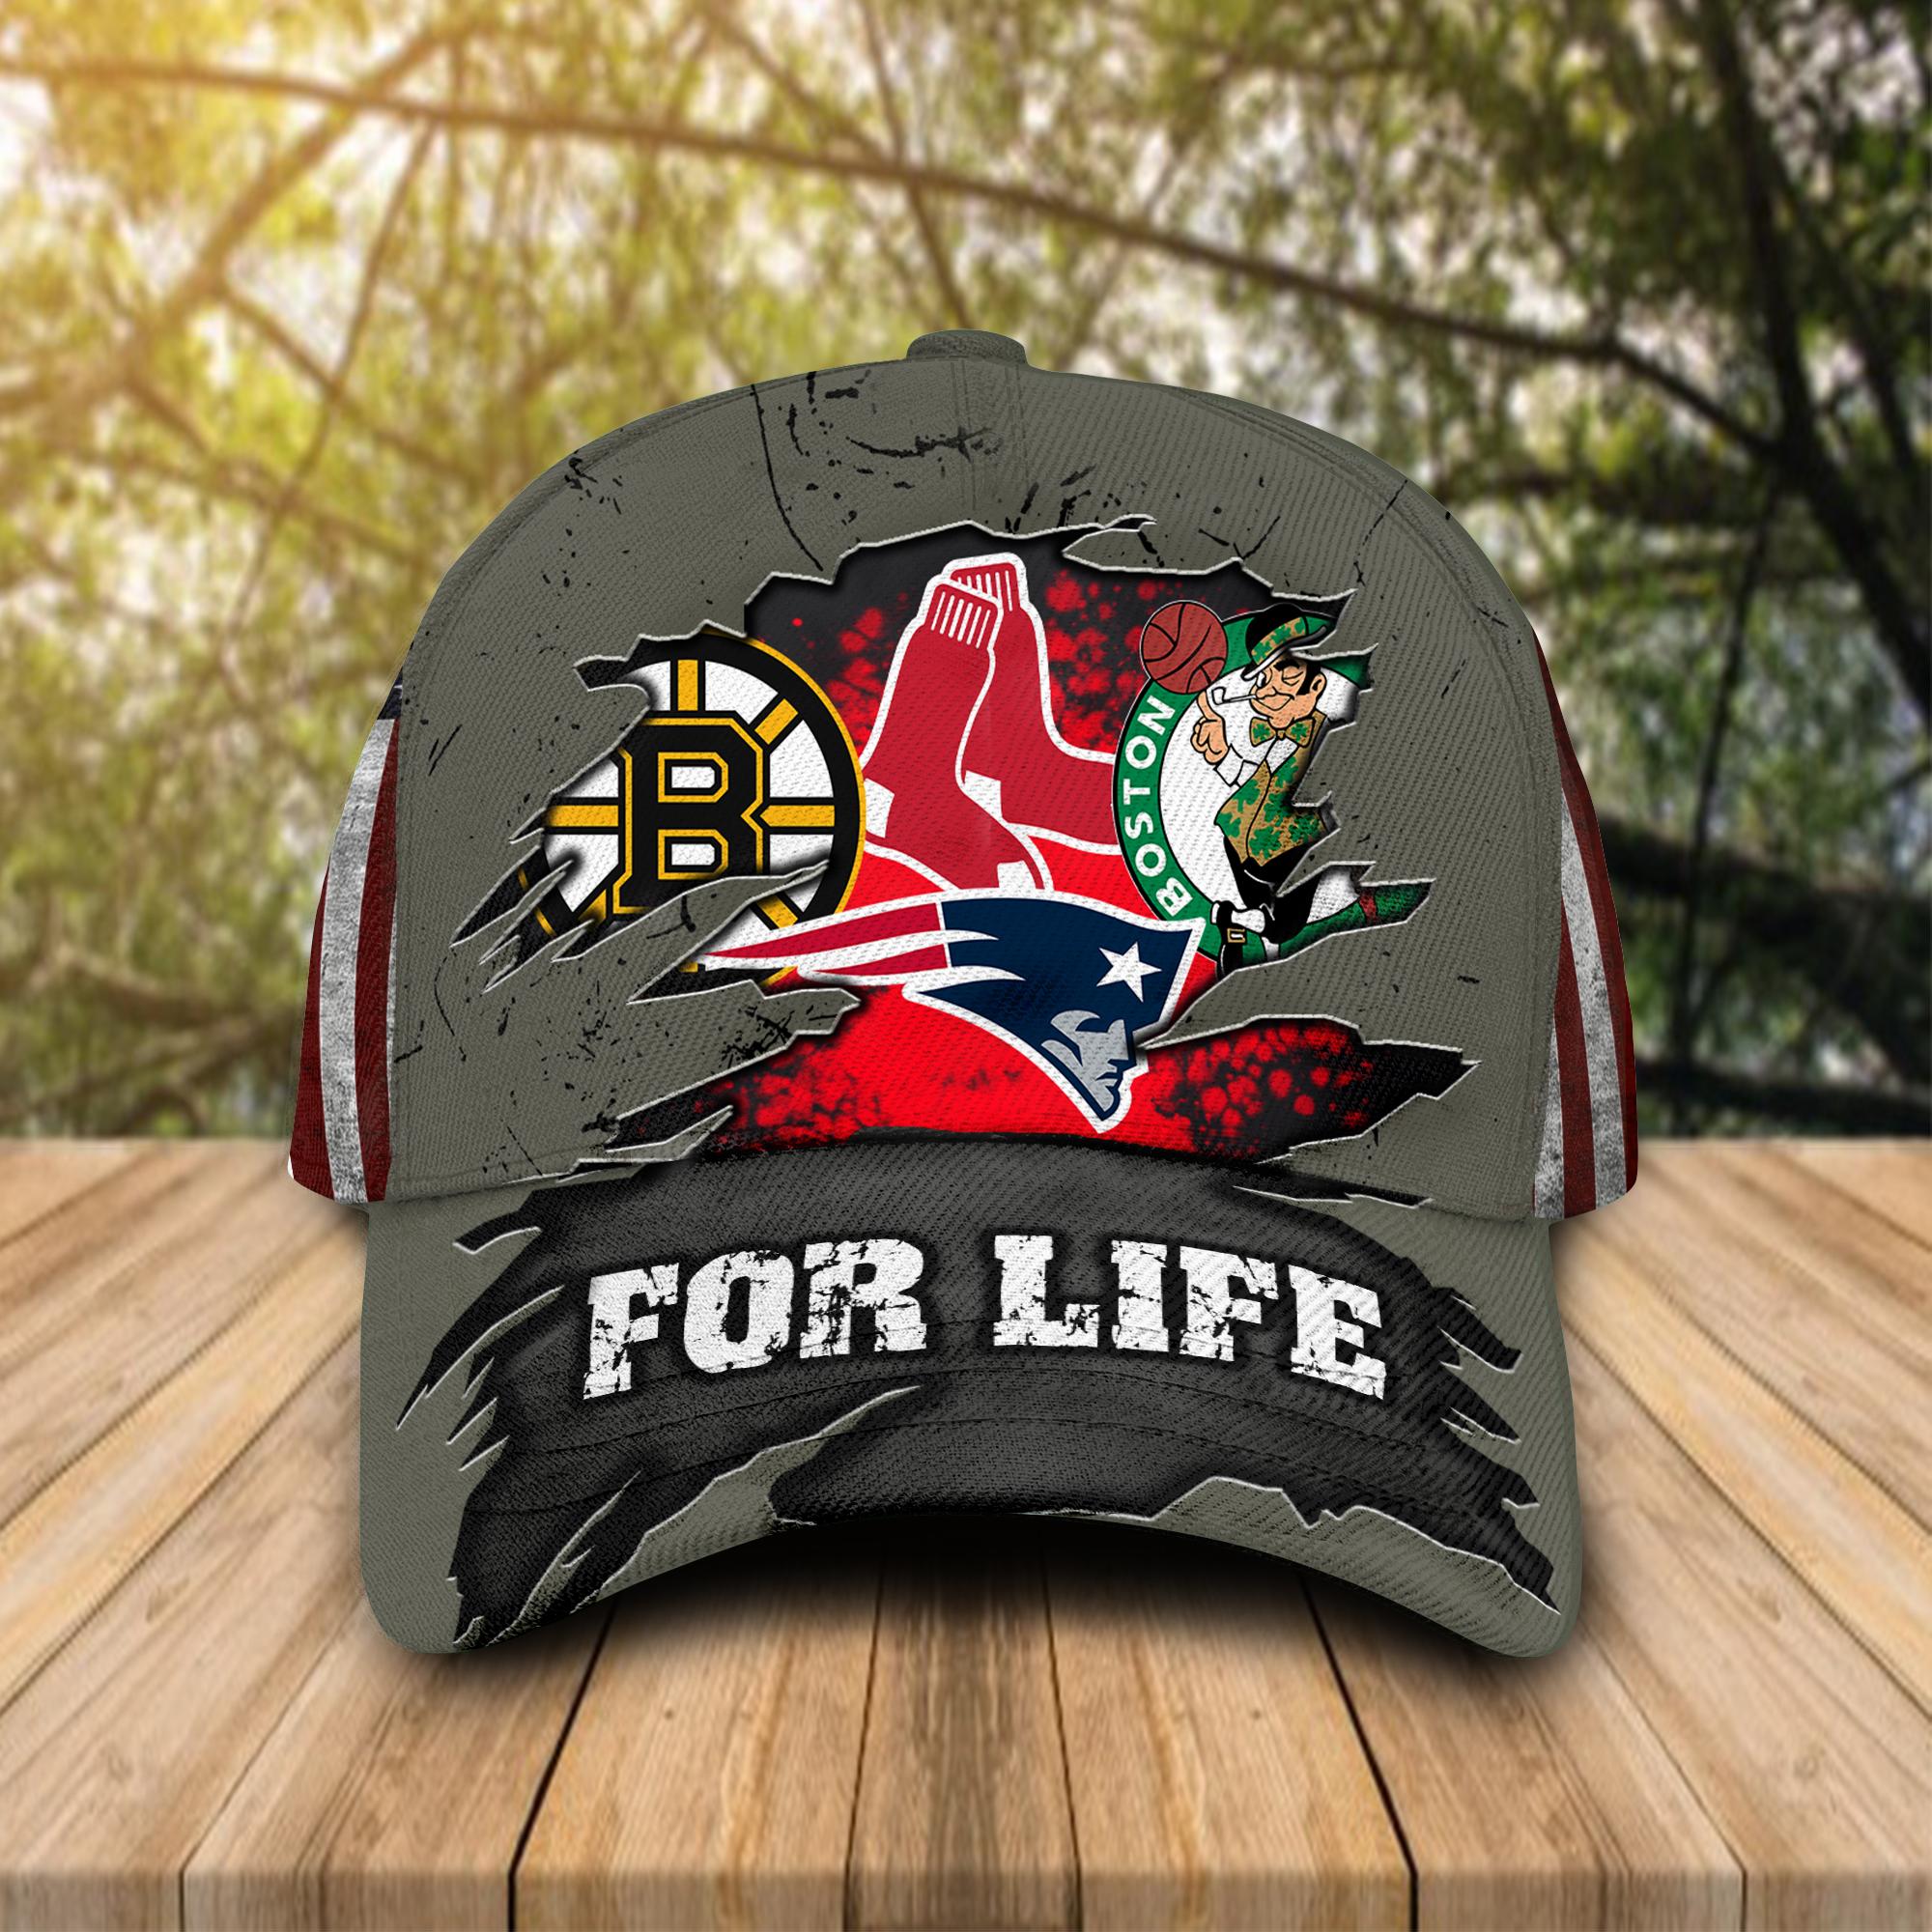 Boston Celtics, New England Patriots, Boston Bruins, Boston Red Sox For Life Cap